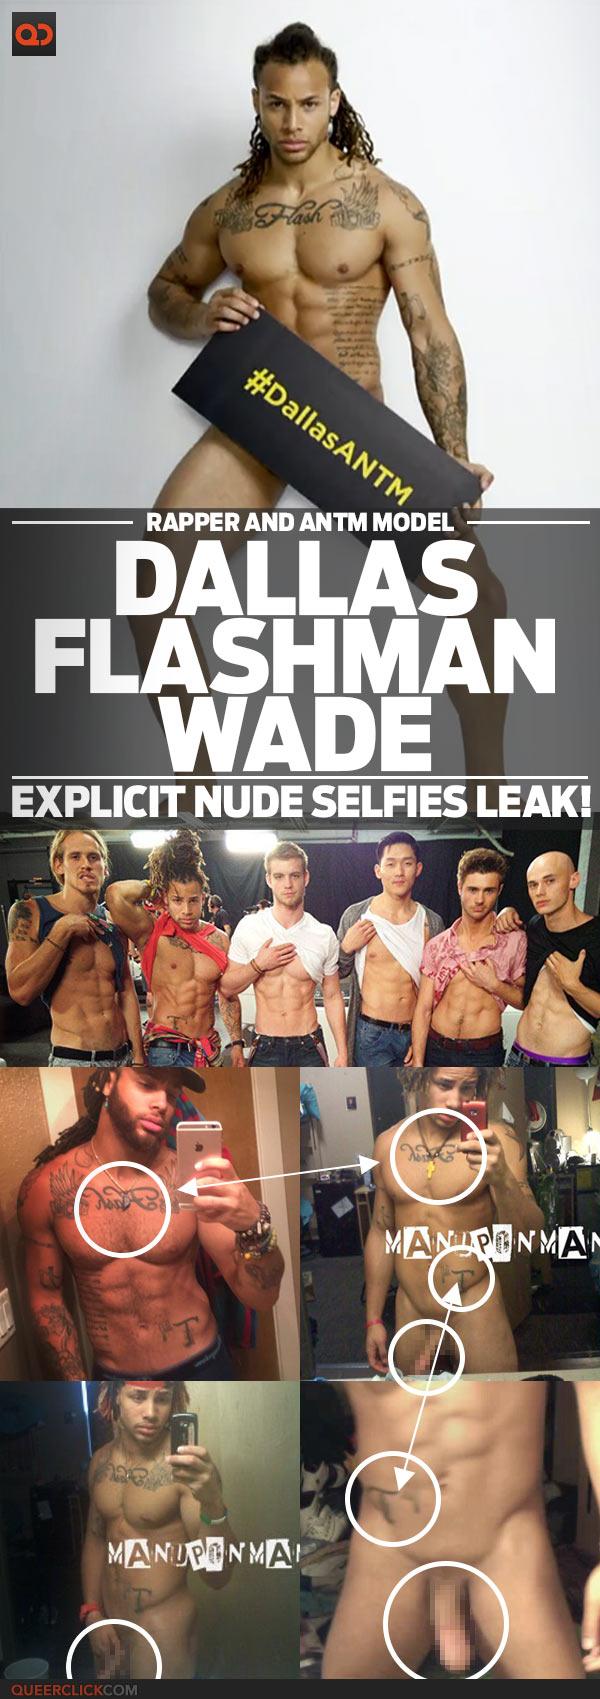 Dallas Flashman Wade, Rapper And ANTM Model, Explicit Nude Selfies Leak!